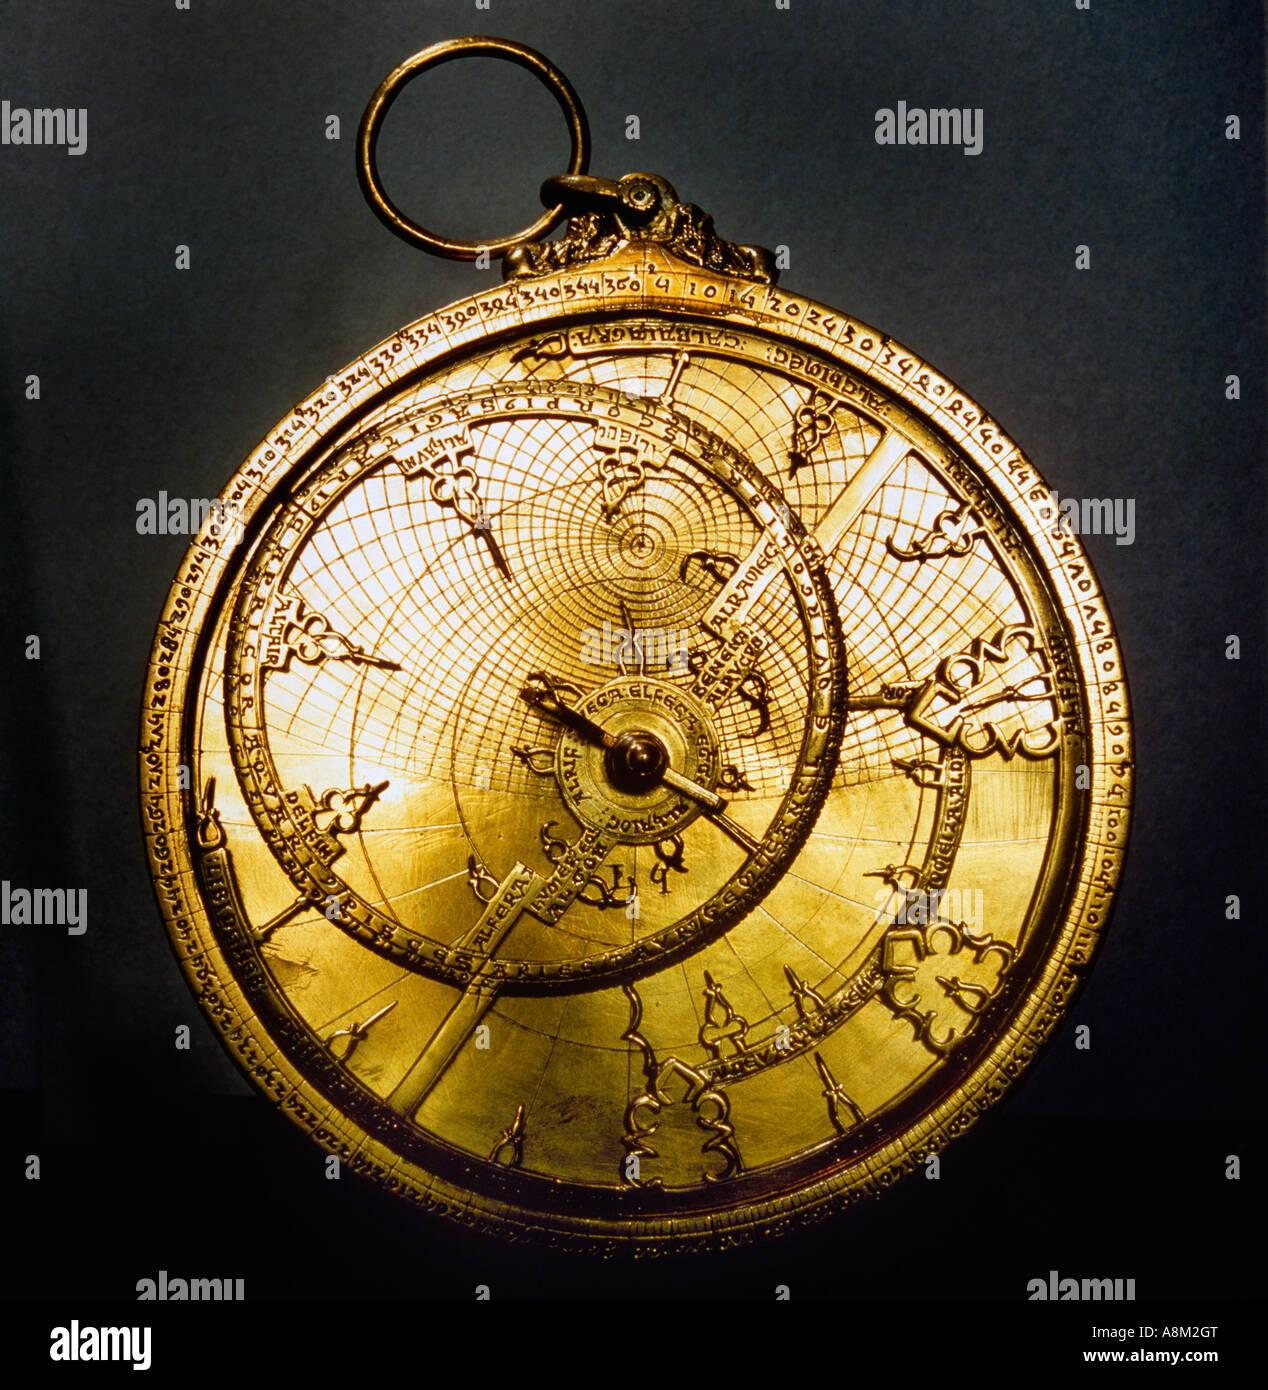 Astrolabium Stockbild